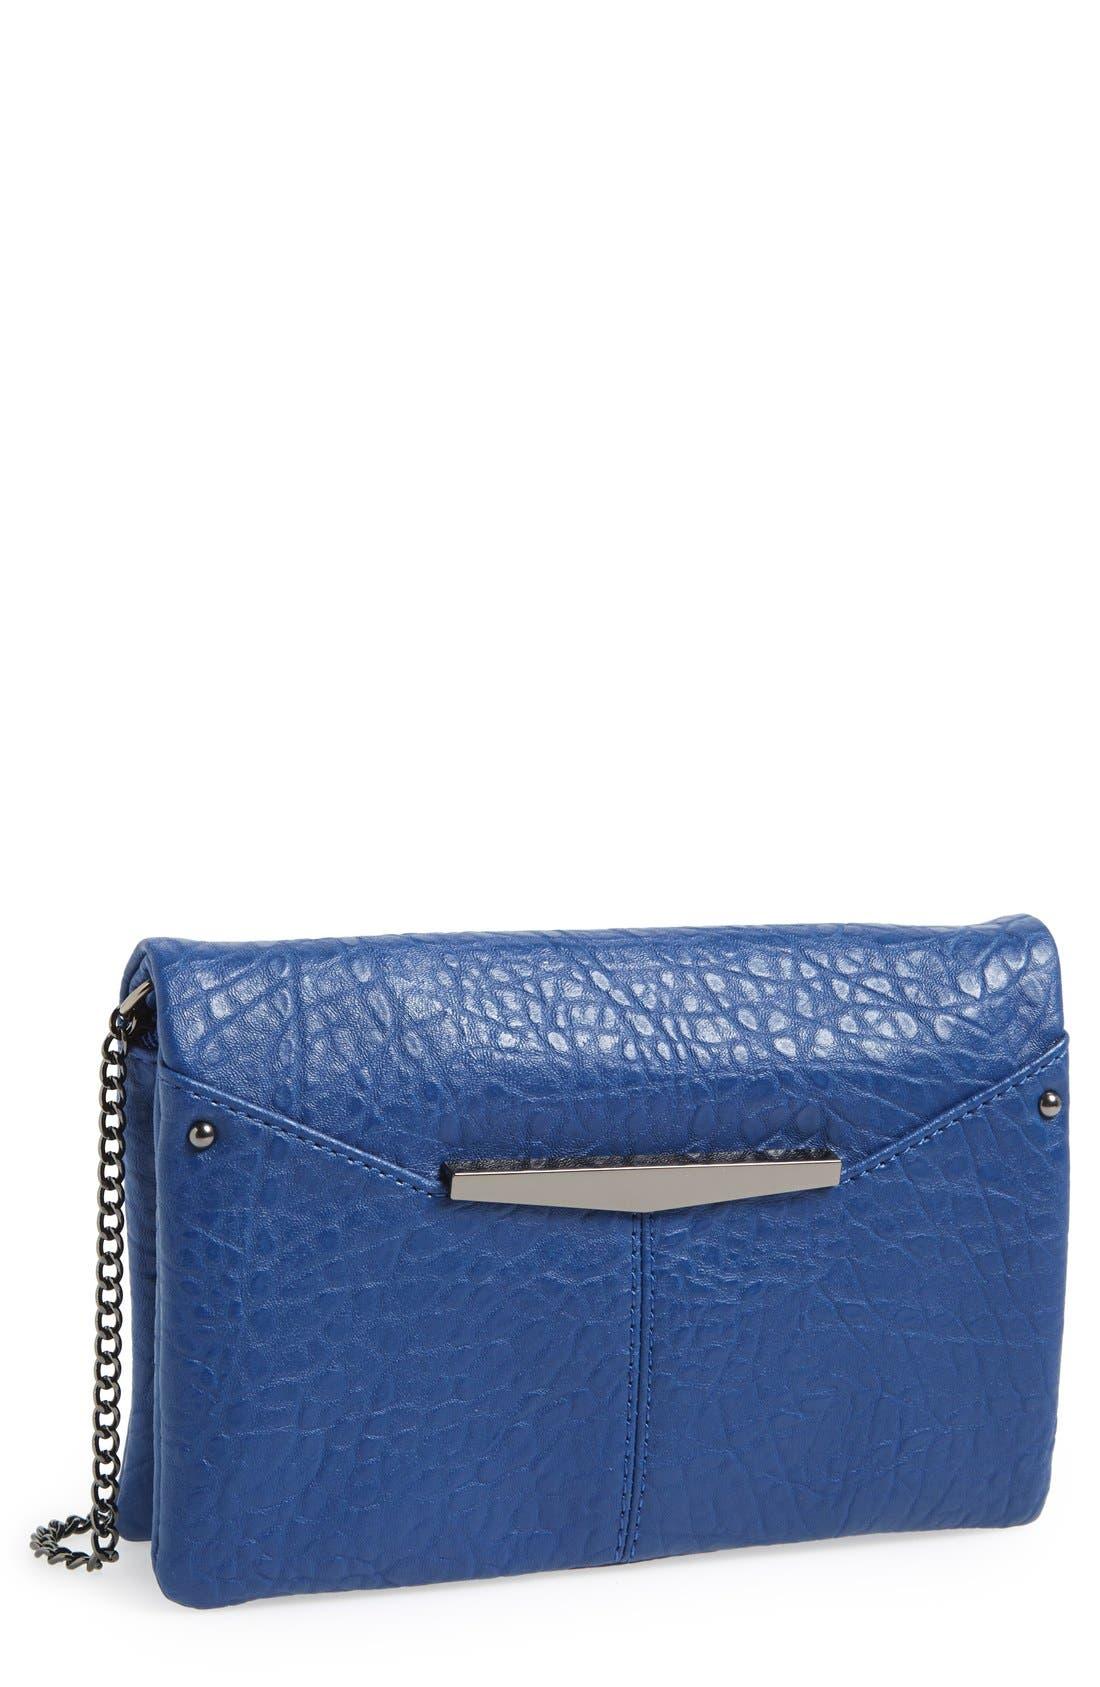 Alternate Image 1 Selected - Danielle Nicole 'Libby' Convertible Crossbody Bag